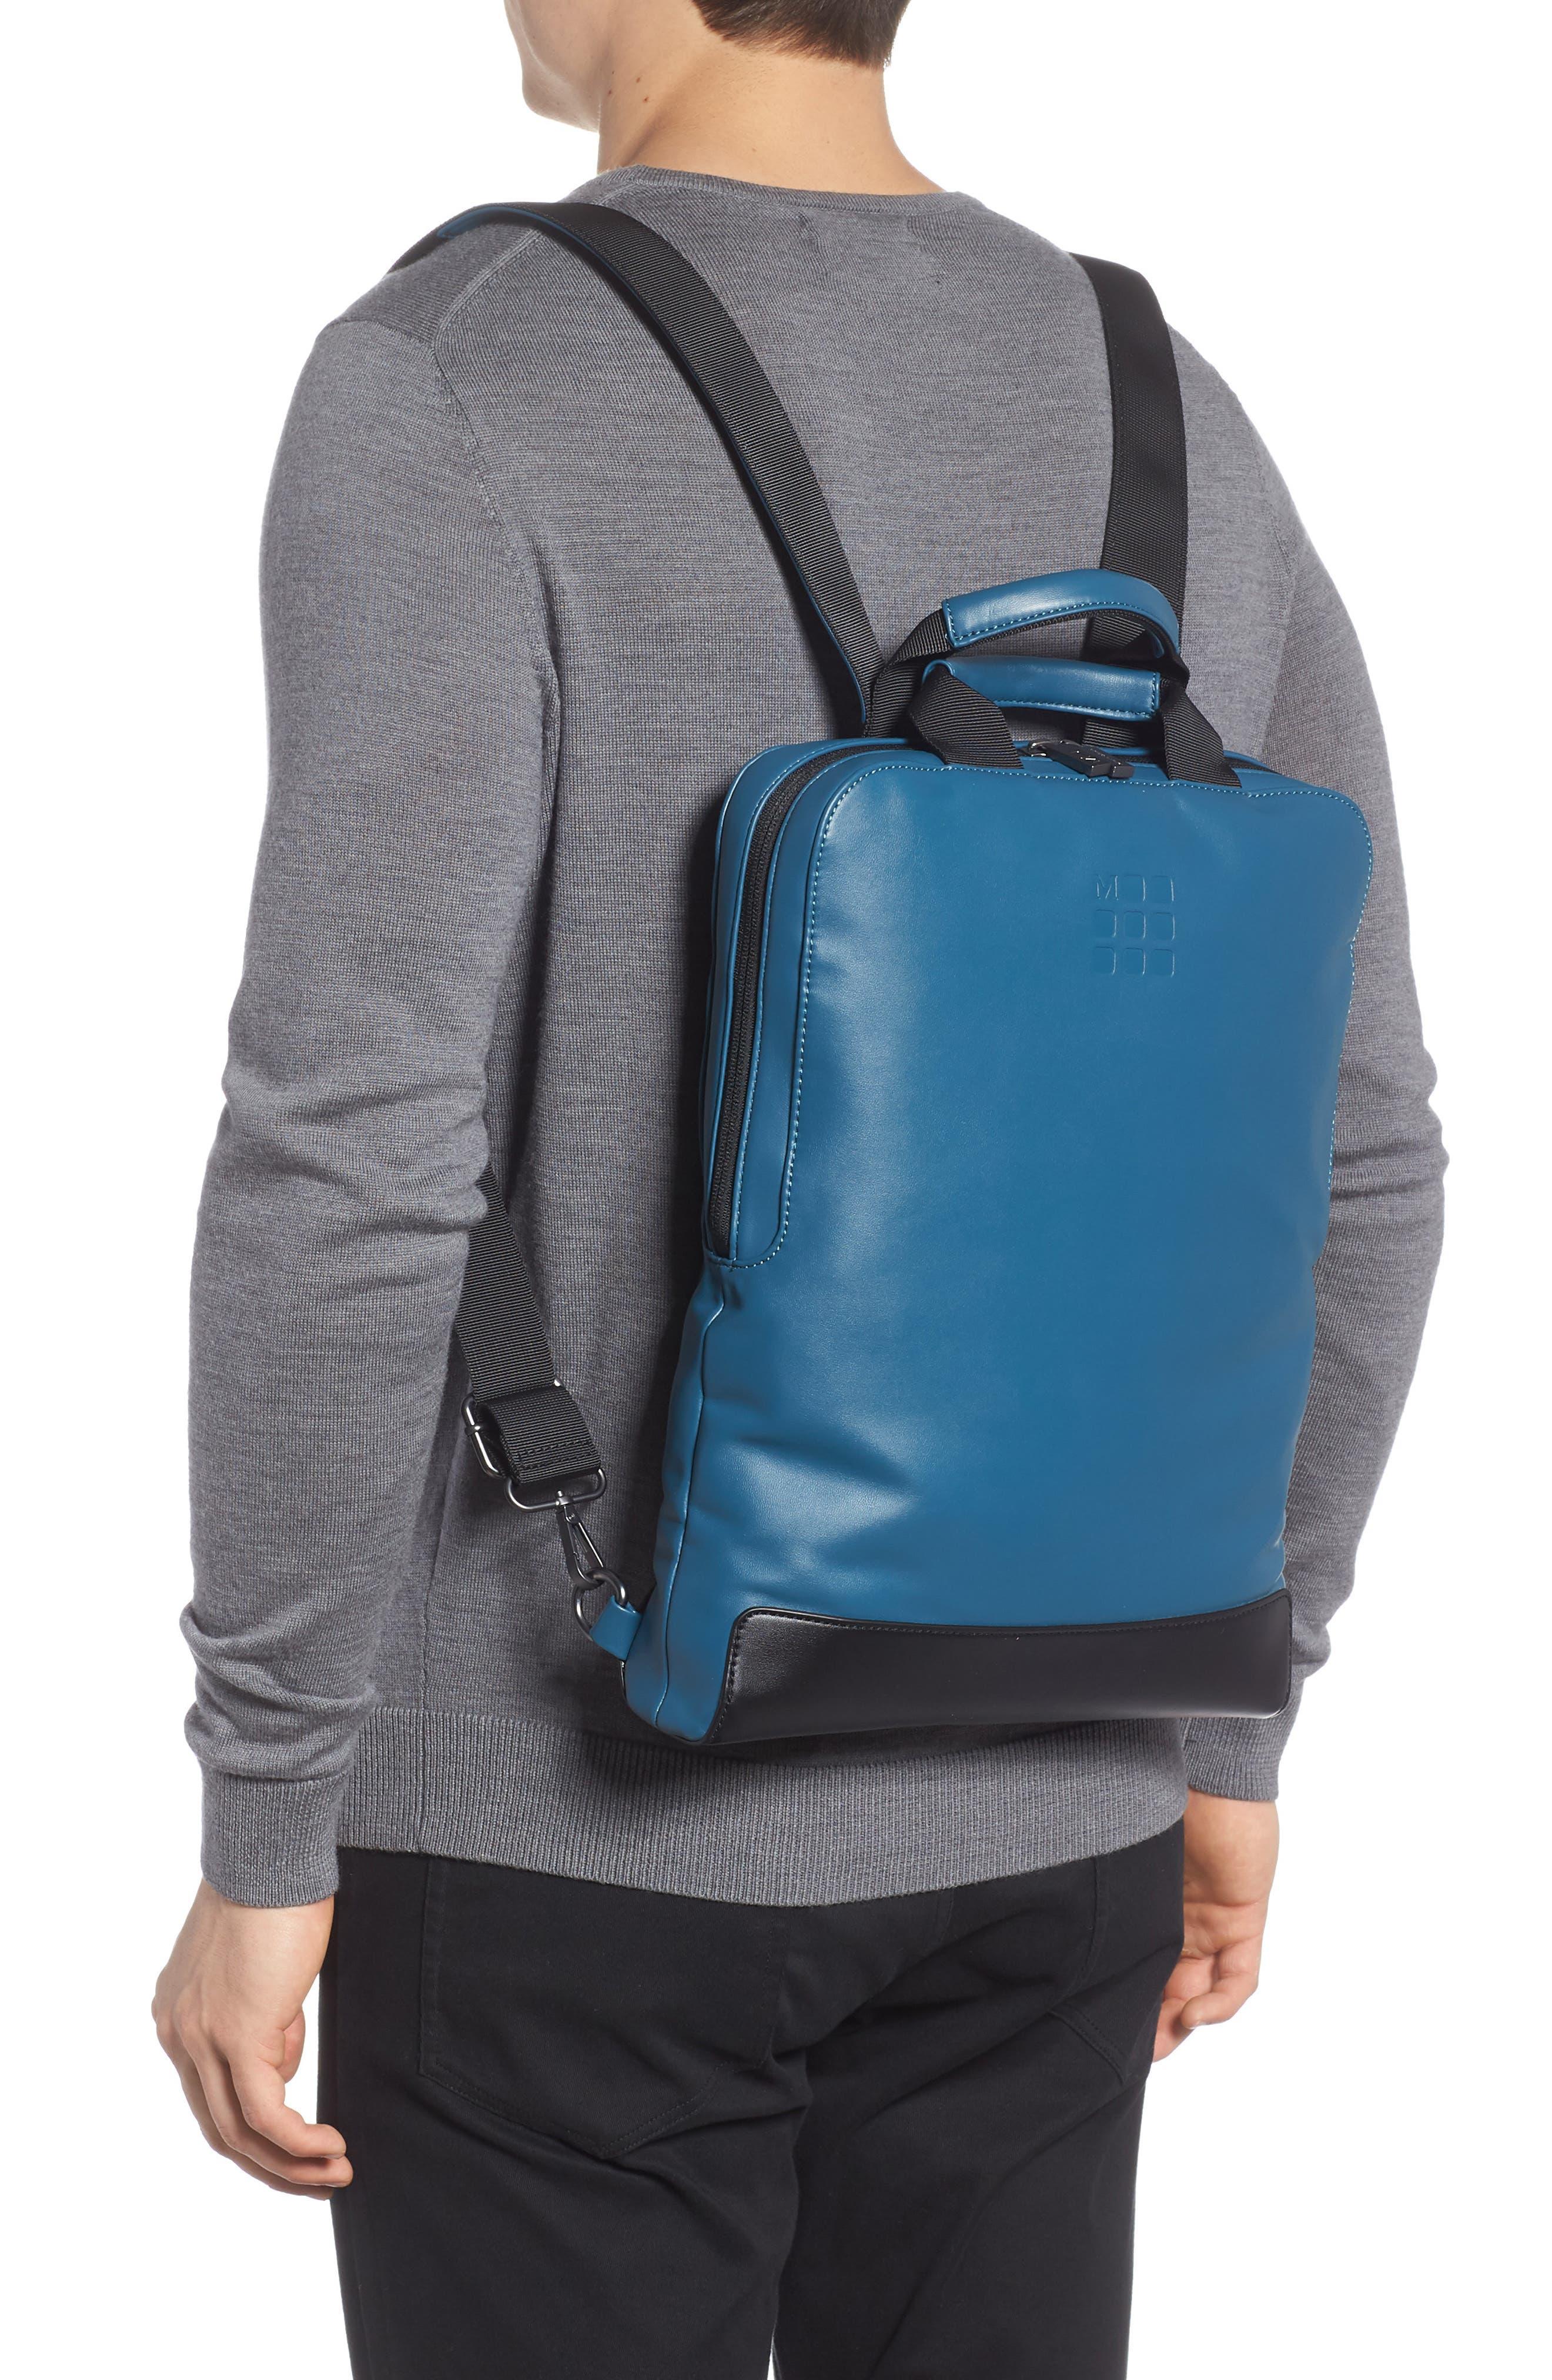 ID Vertical Device Bag,                             Alternate thumbnail 2, color,                             Steel Blue